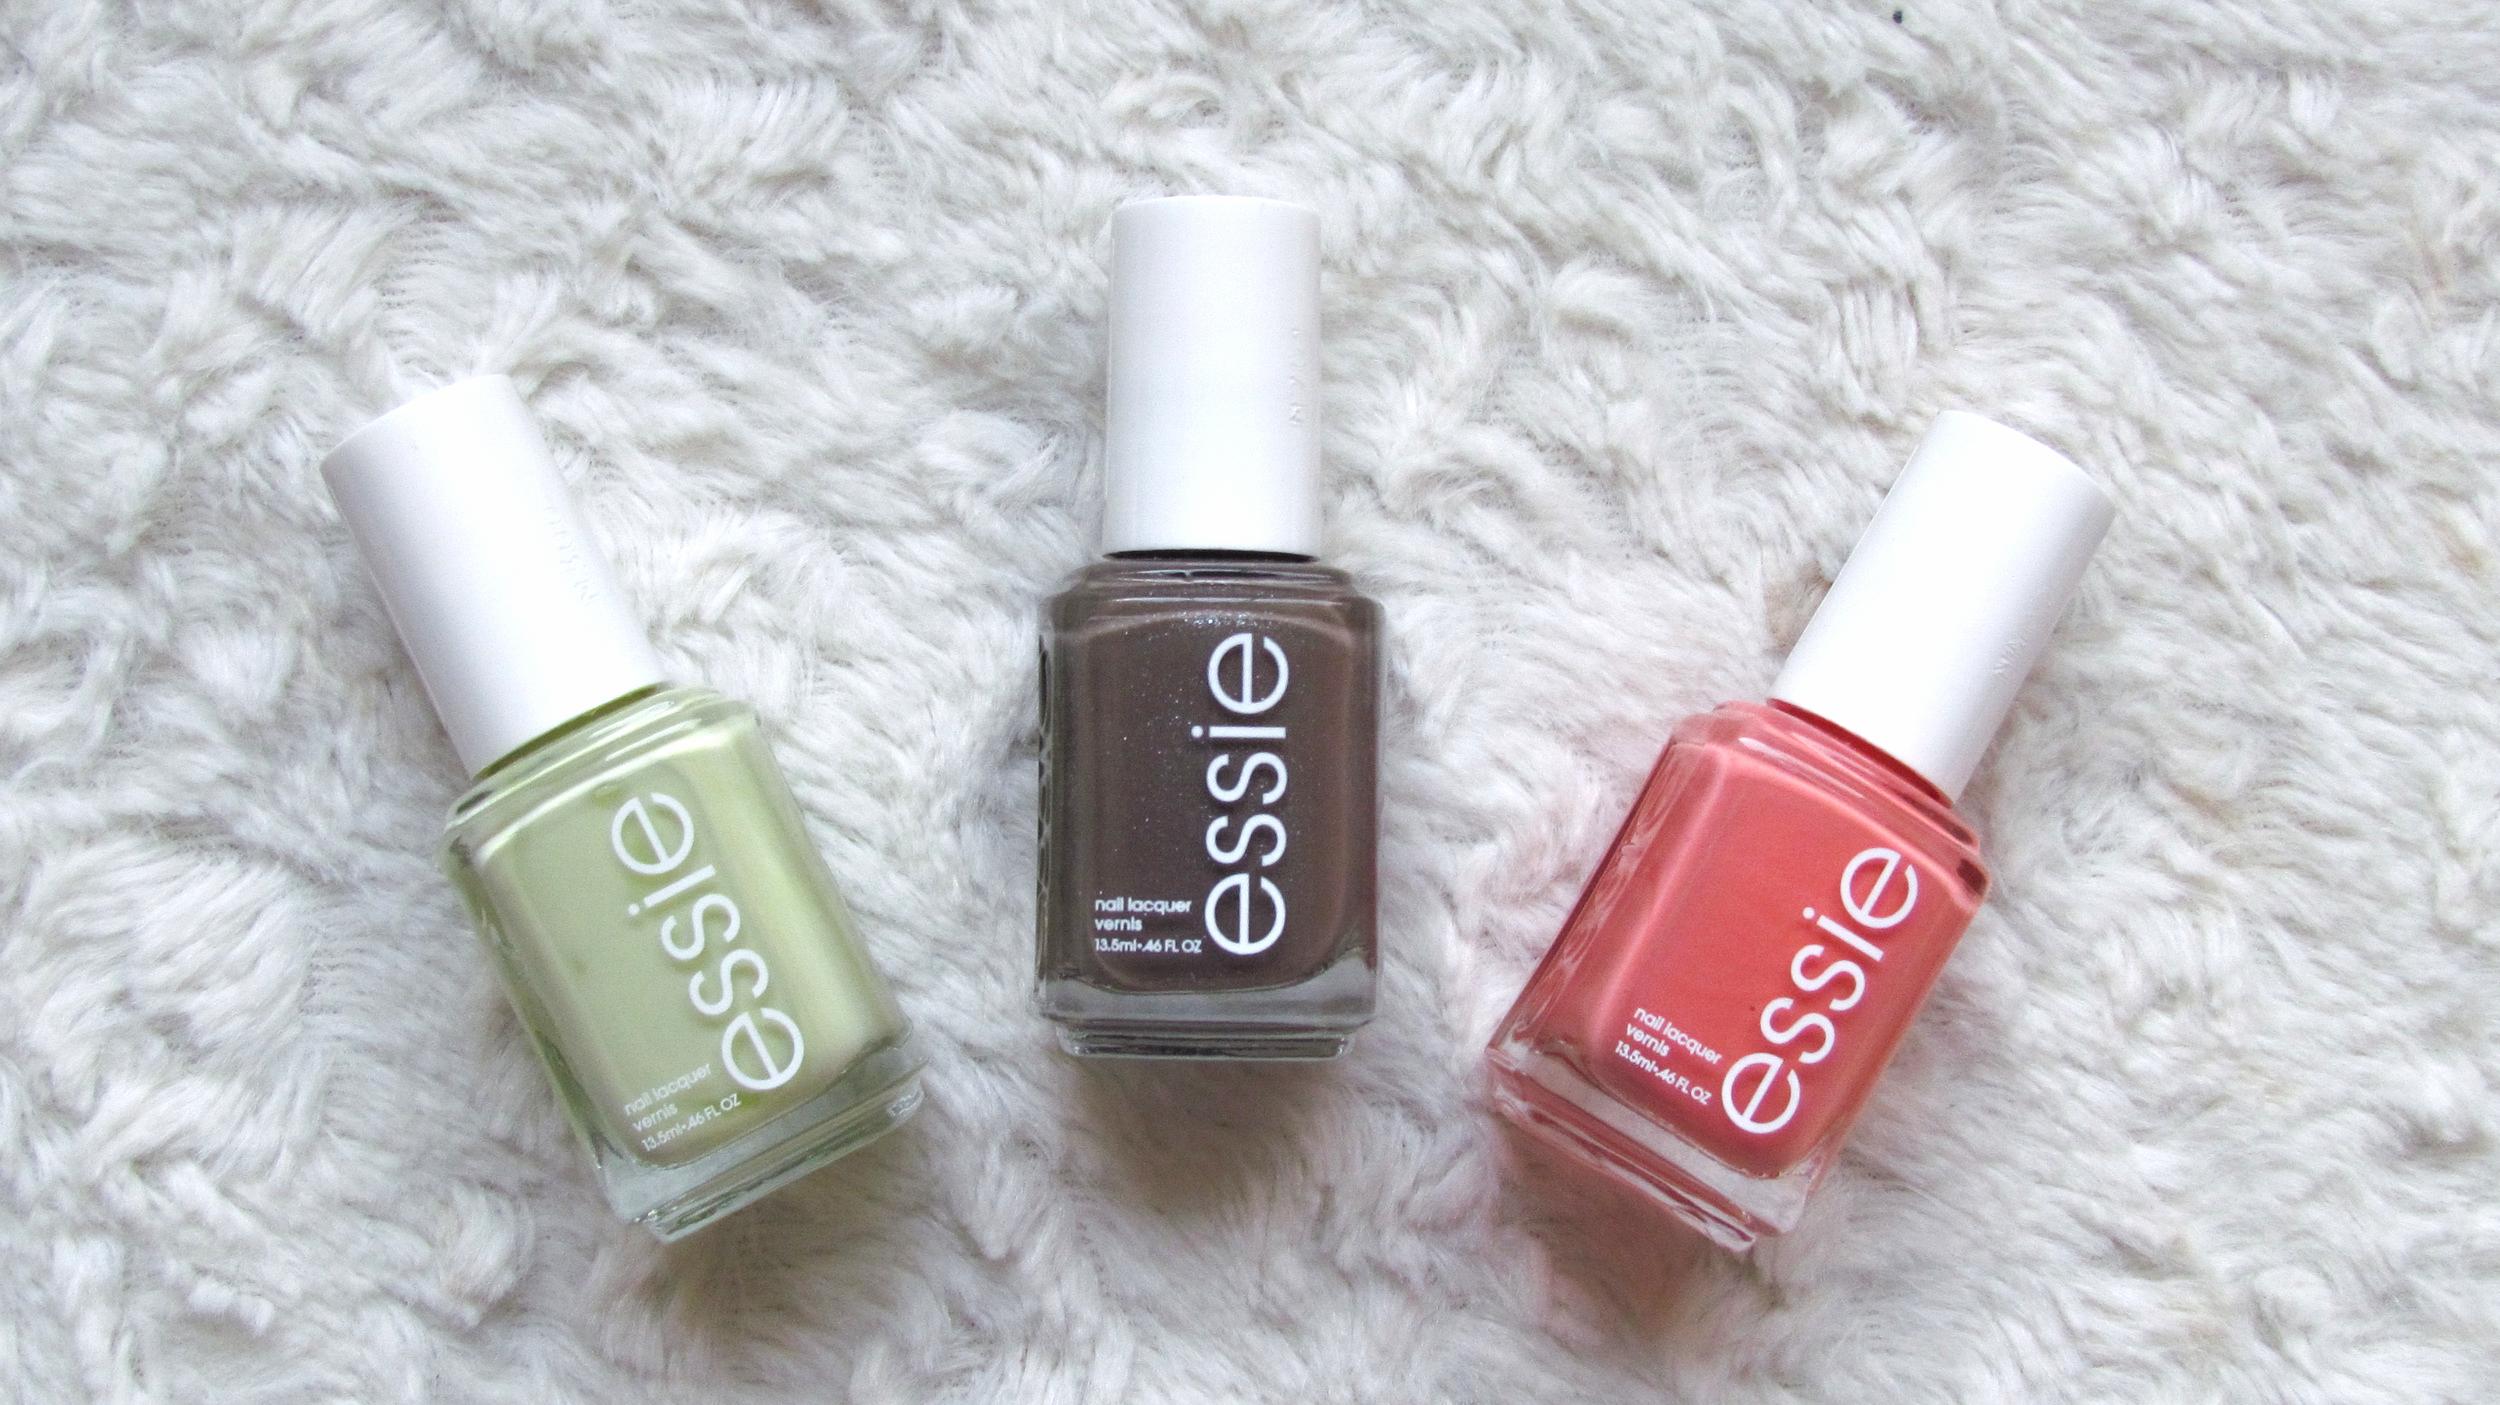 April Favorites - Essie nail polish in Tart Deco, Mochachino, and Chillato